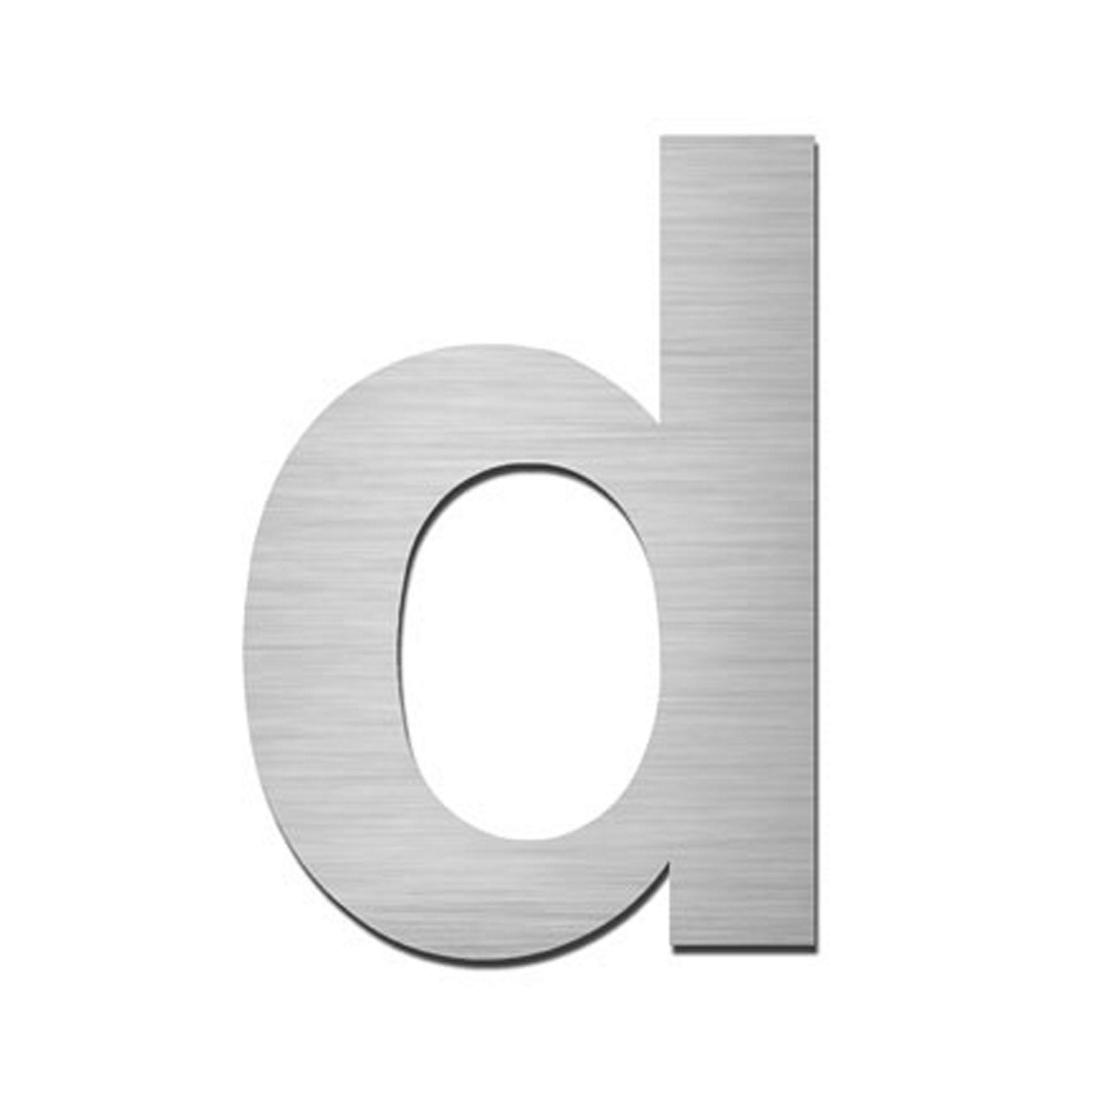 hausnummer index zum aufkleben d matt geb rstet edelstahl silber moebel. Black Bedroom Furniture Sets. Home Design Ideas